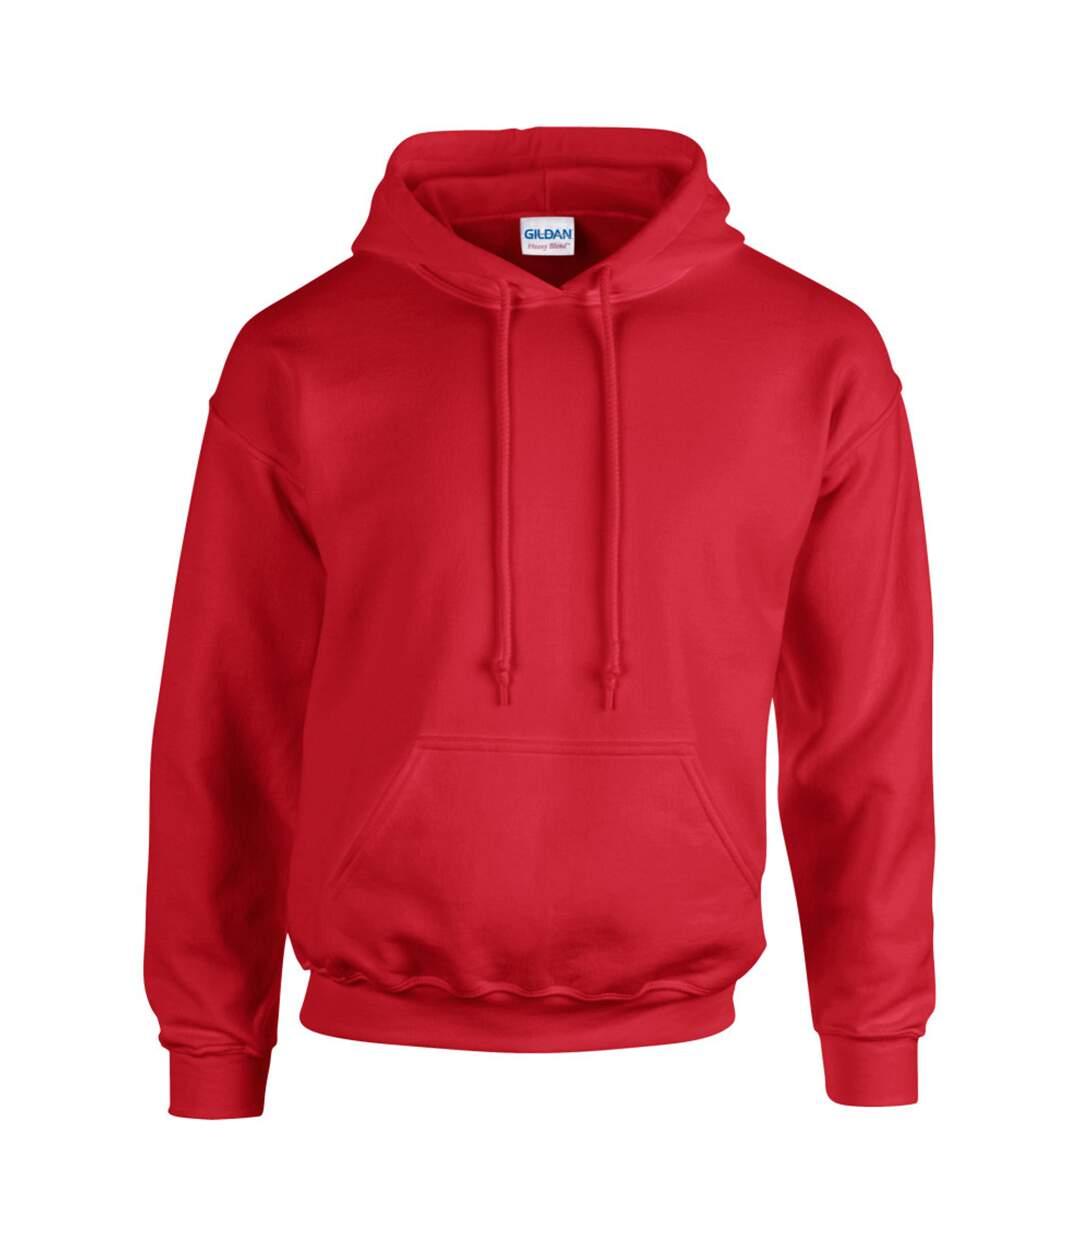 Gildan Heavy Blend Adult Unisex Hooded Sweatshirt / Hoodie (Sand) - UTBC468